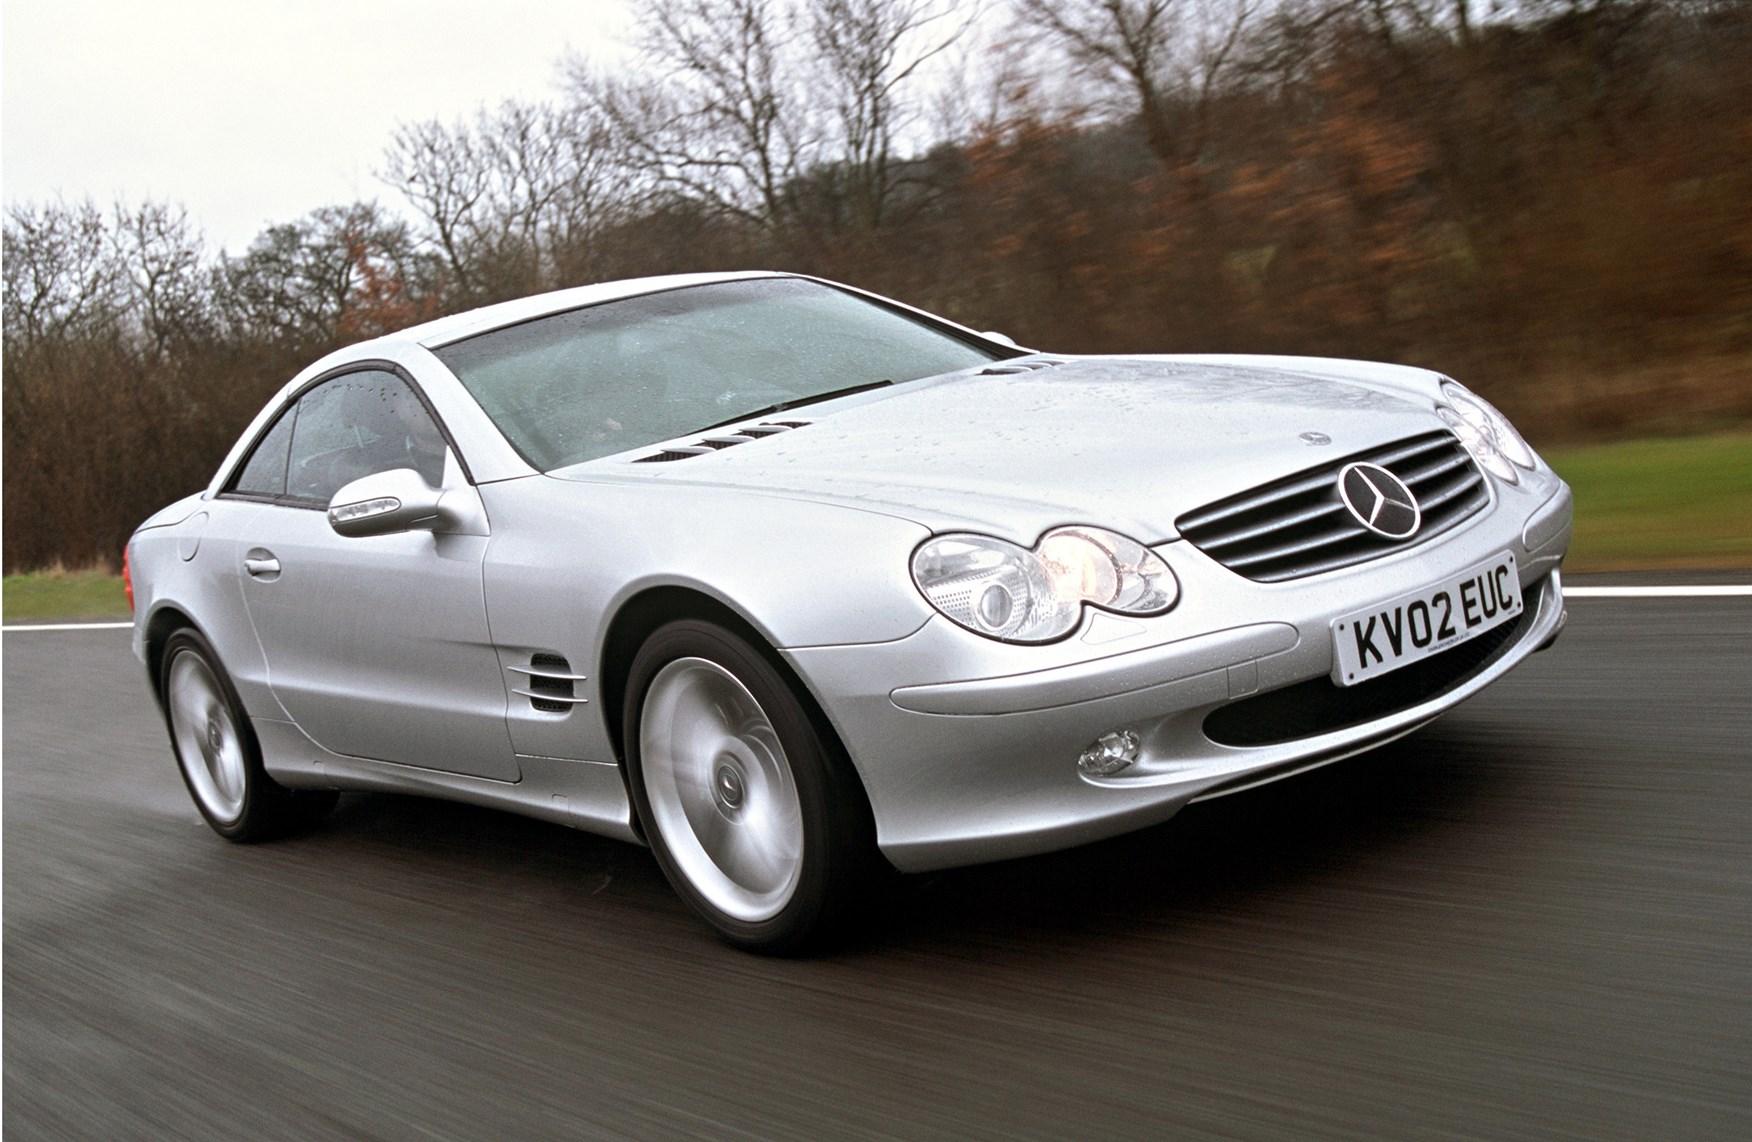 Mercedes Benz SL Class Convertible 2002 2011 Rivals